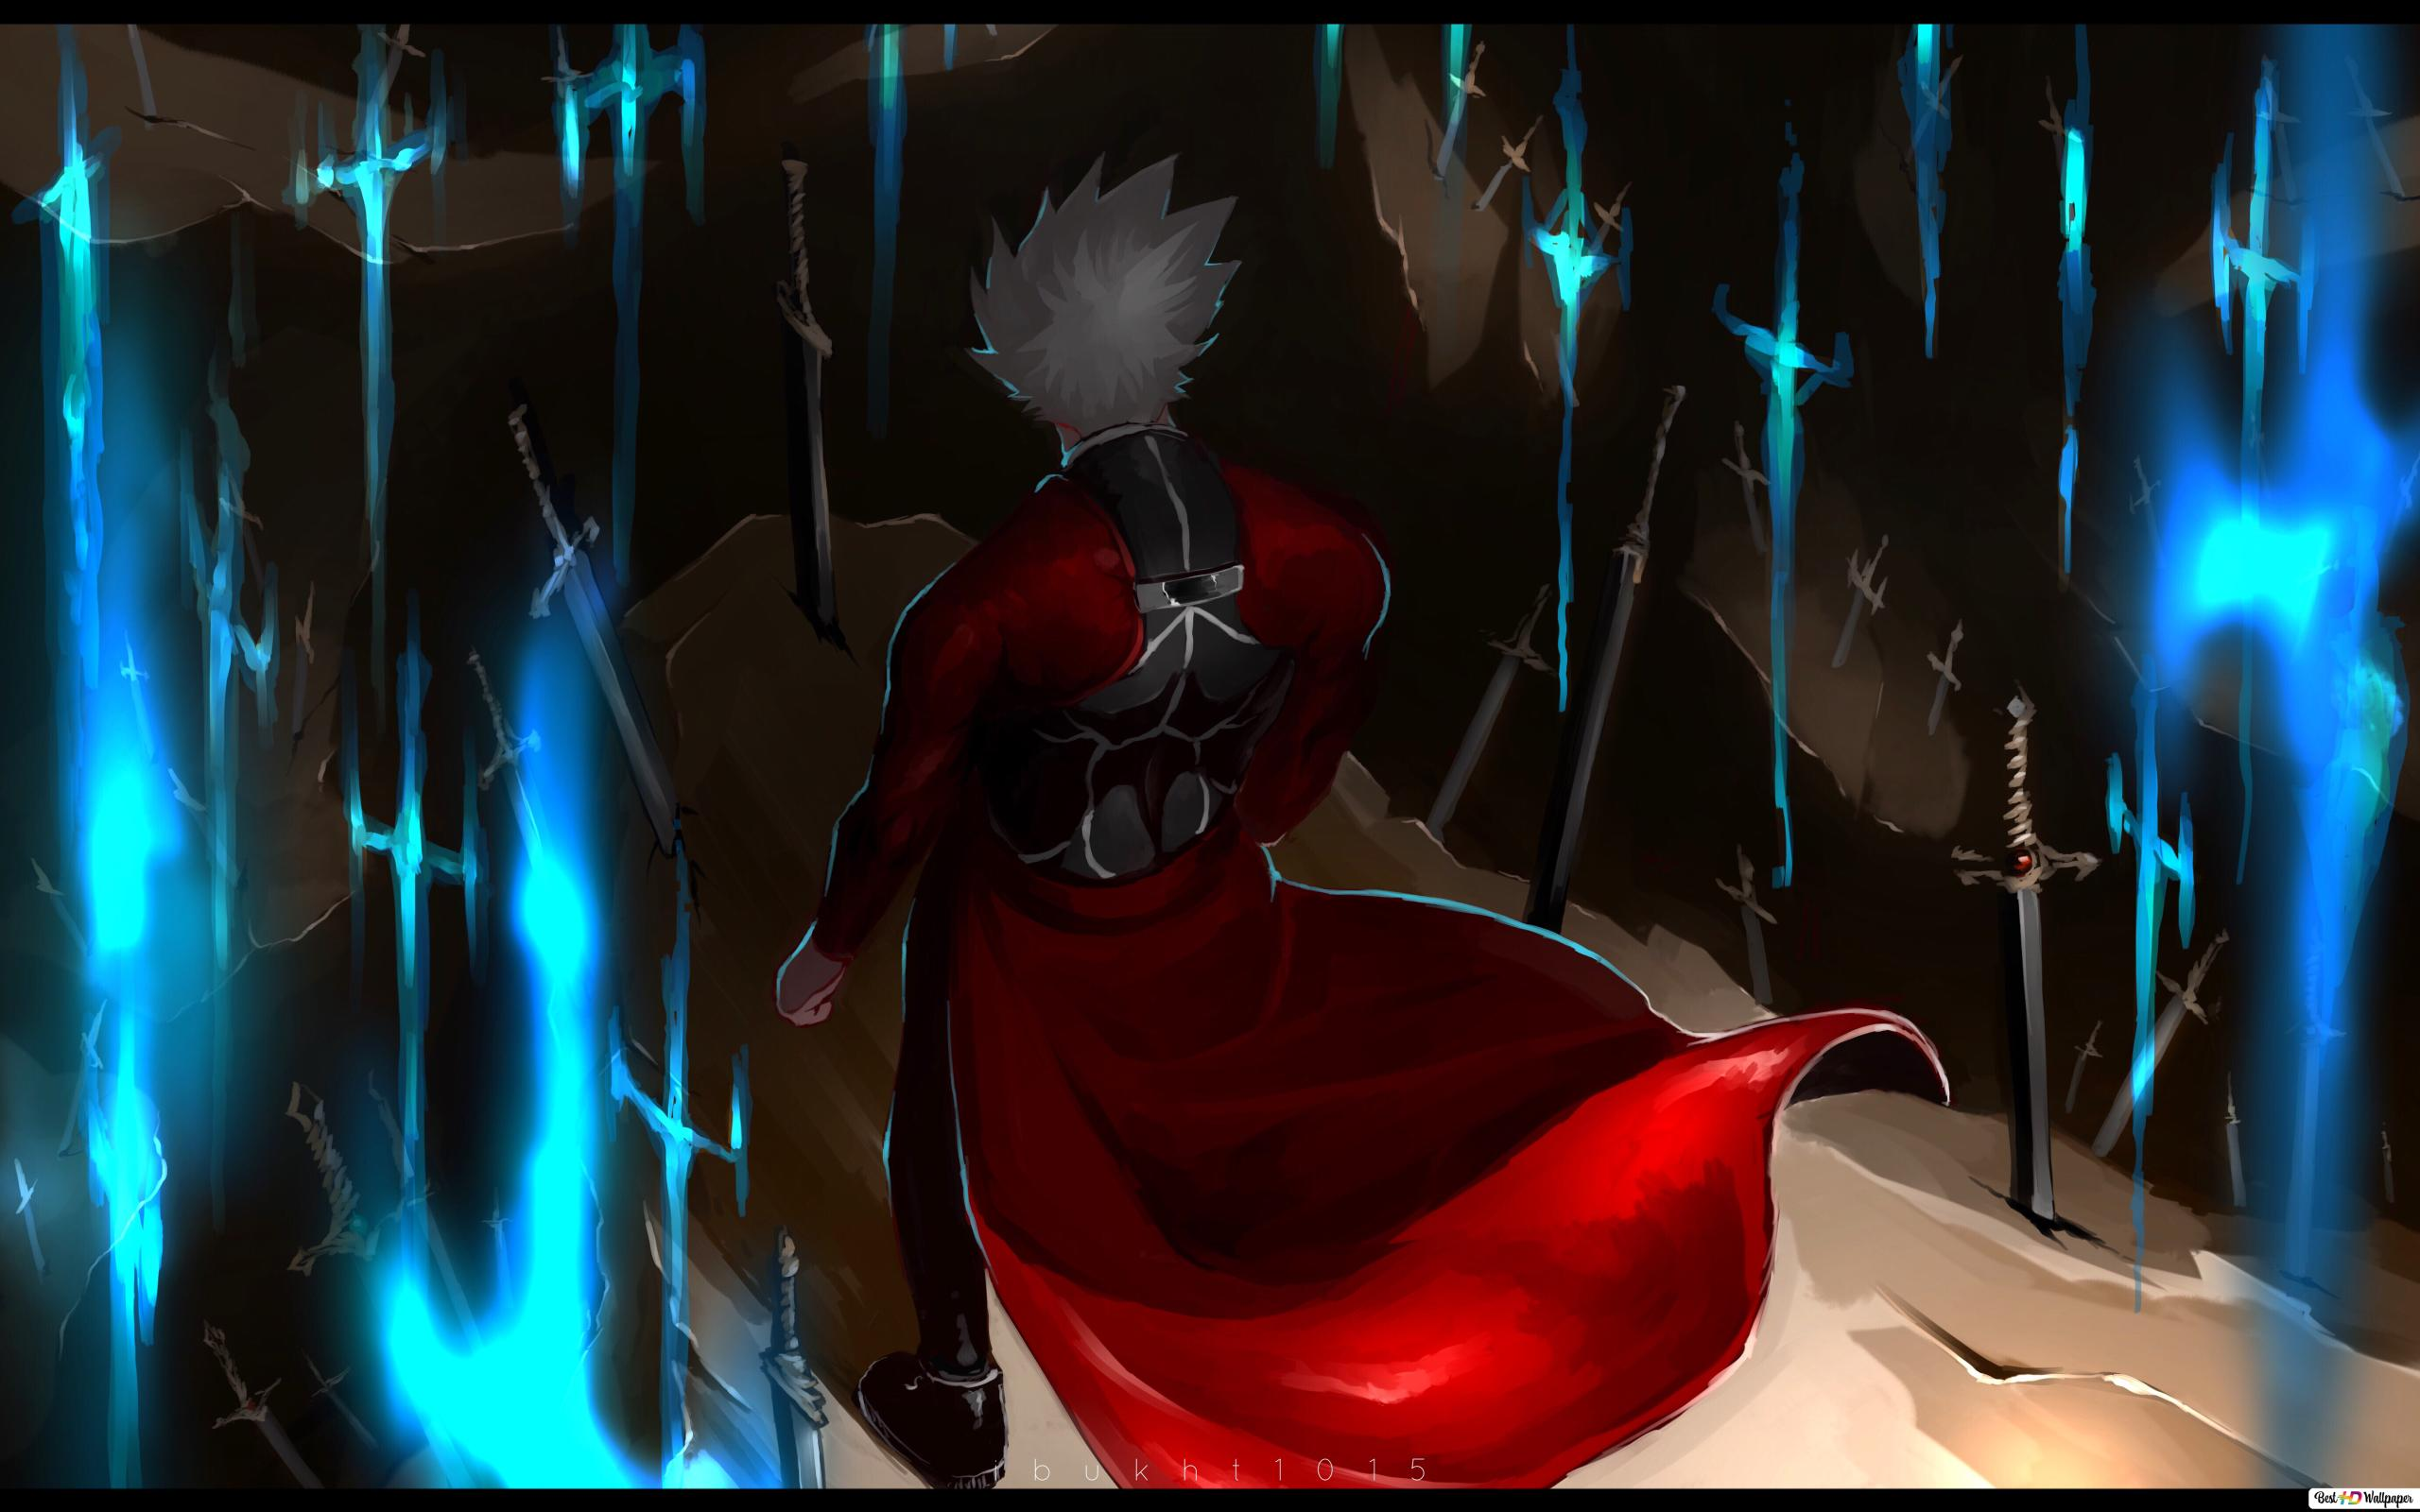 Fate/stay night: unlimited blade works artoria pendragon hd.